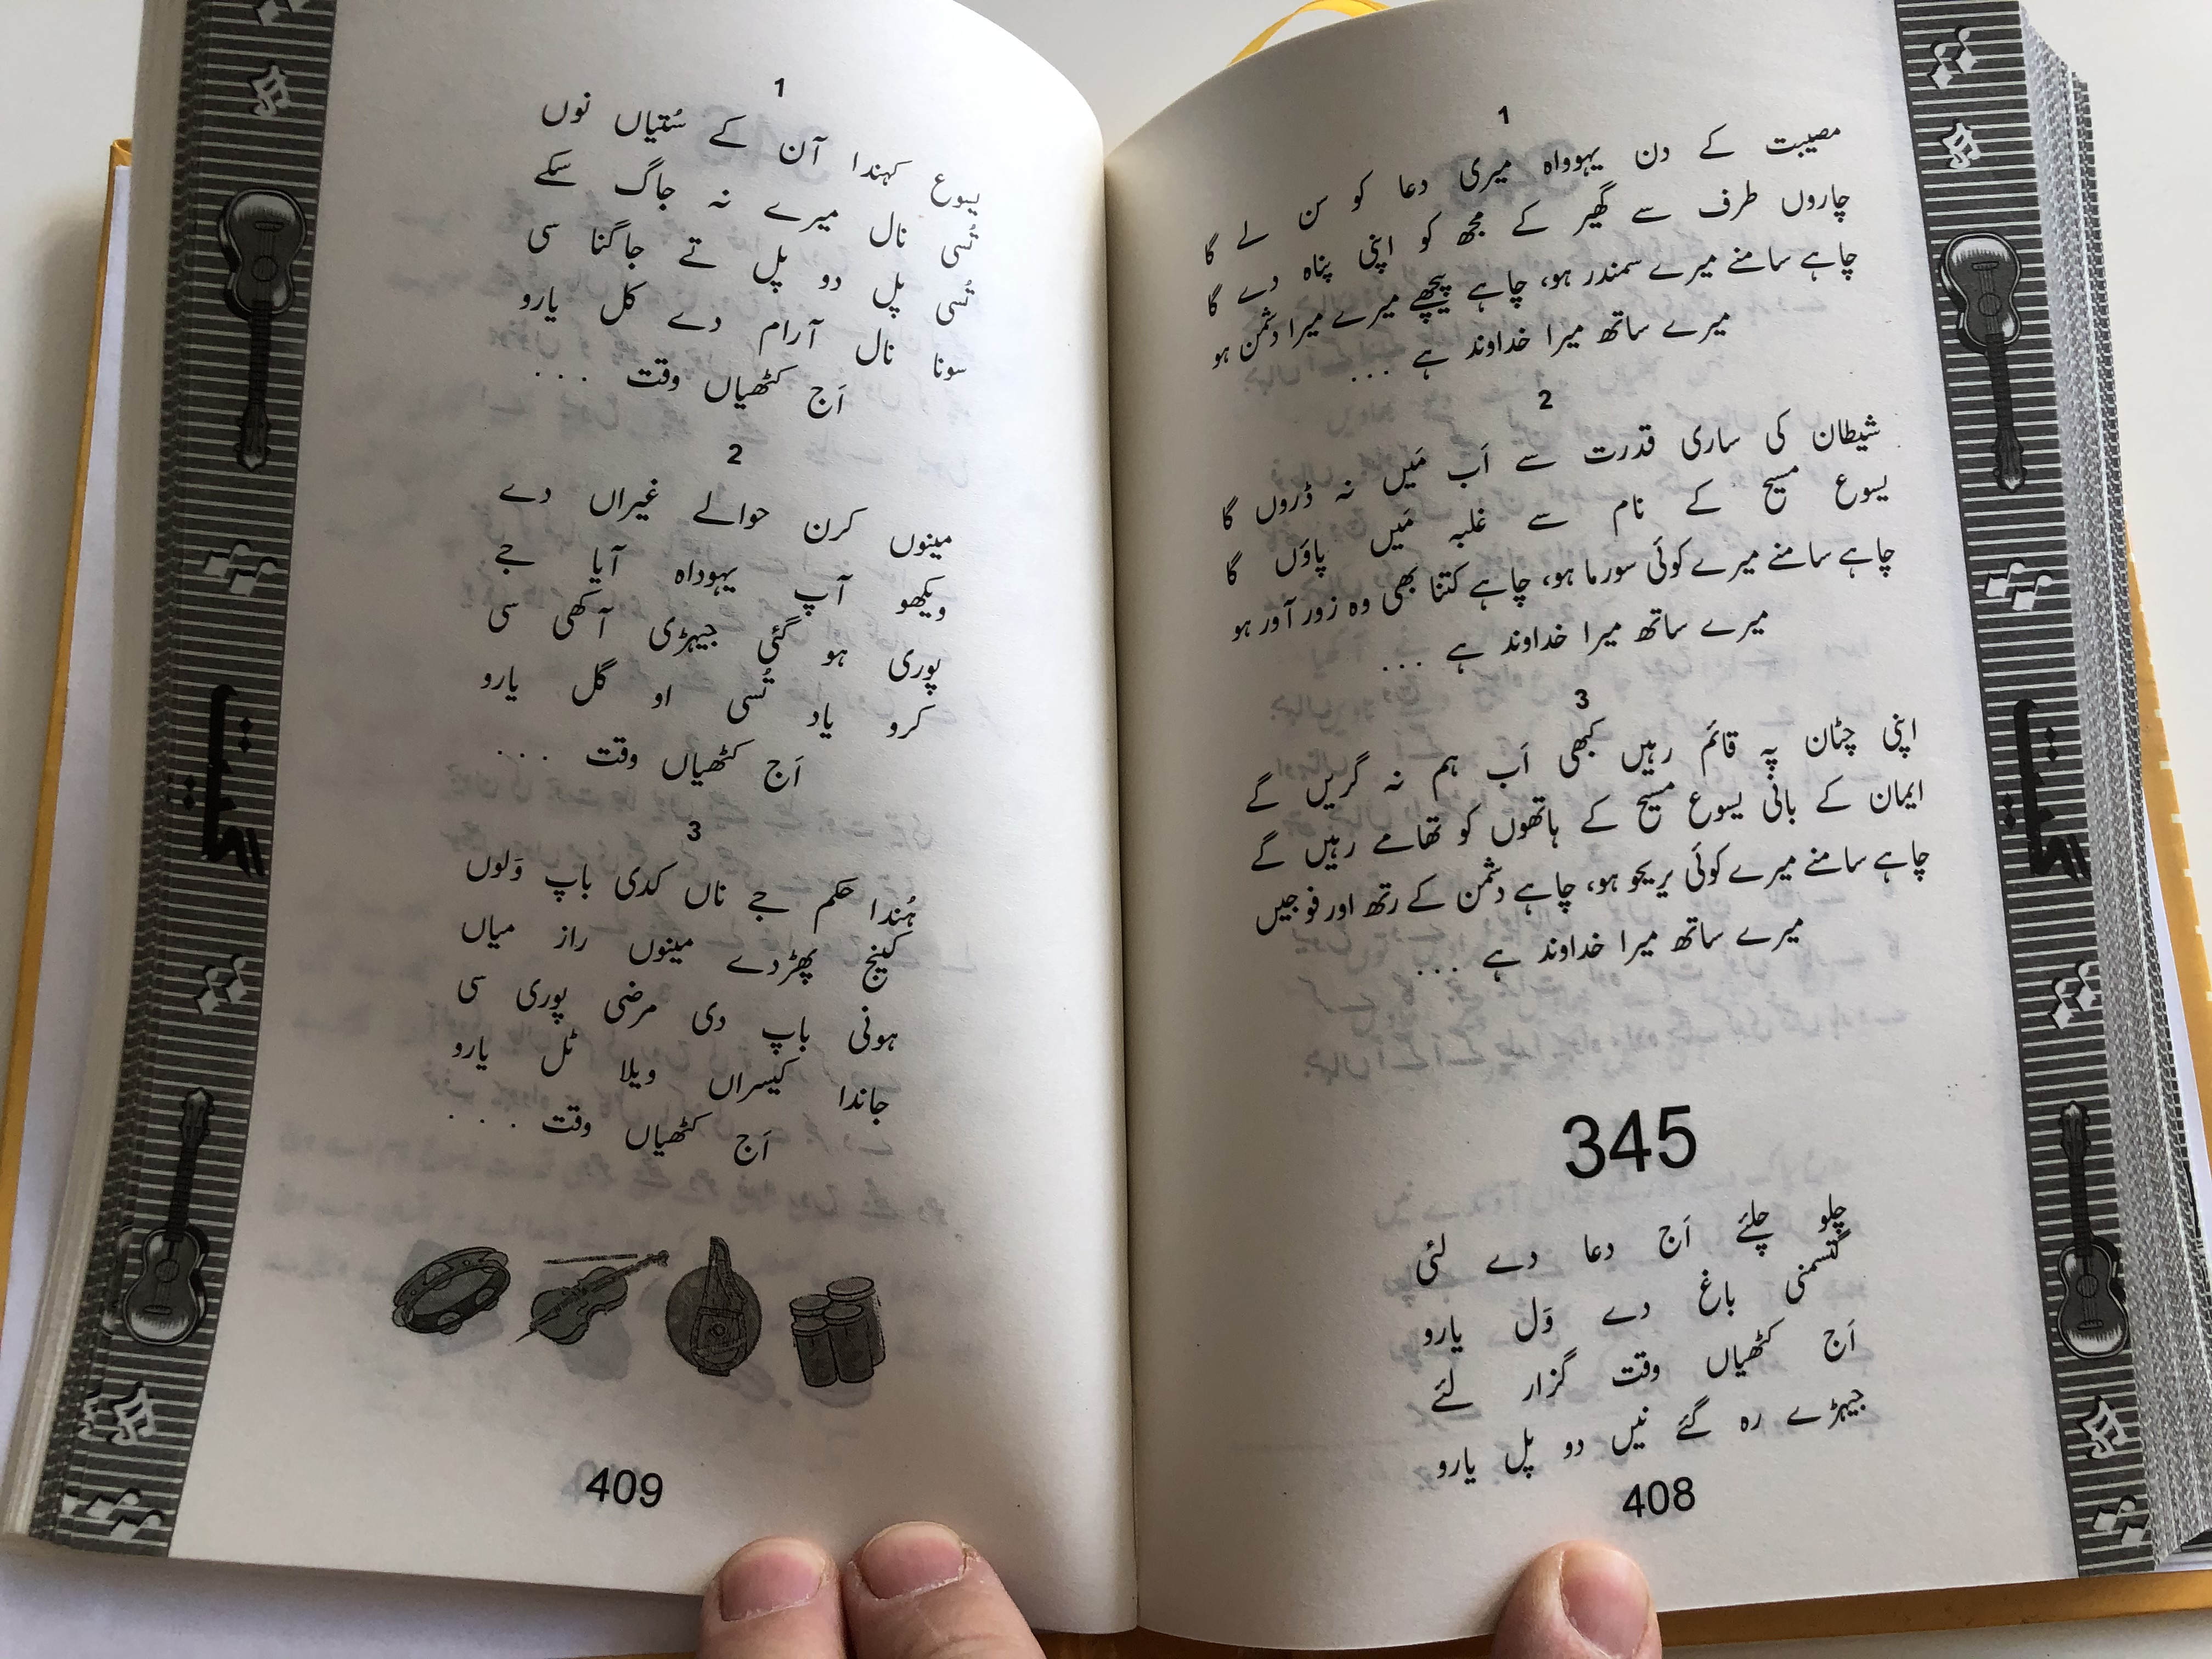 urdu-hymn-book-ruh-ki-khushi-songs-zaboor-9-.jpg